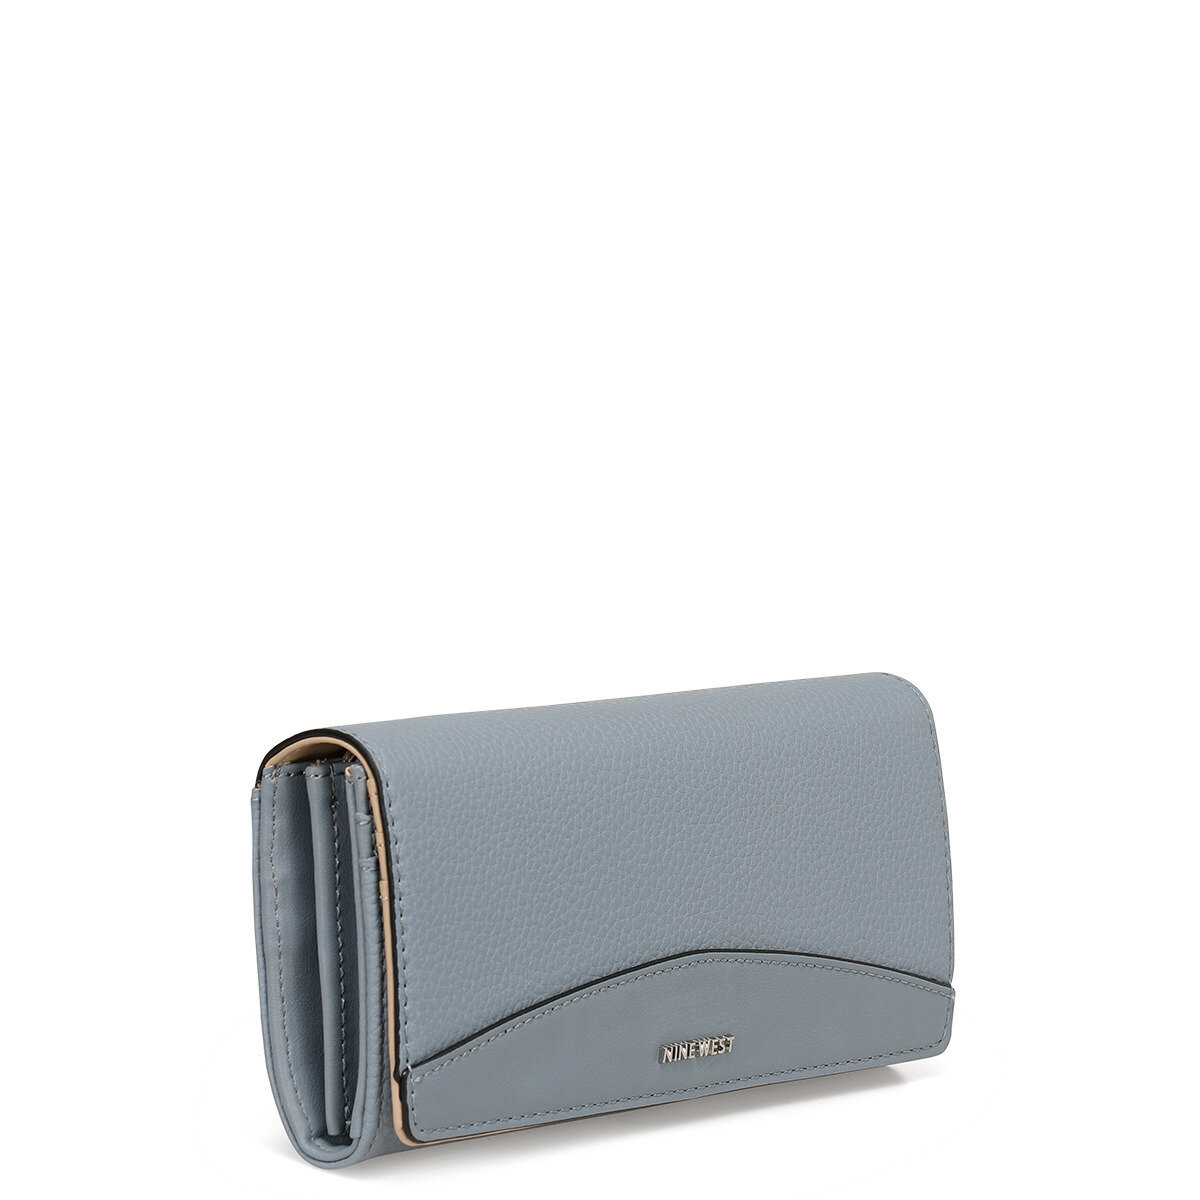 CARA NYB109359 Mavi Kadın Clutch